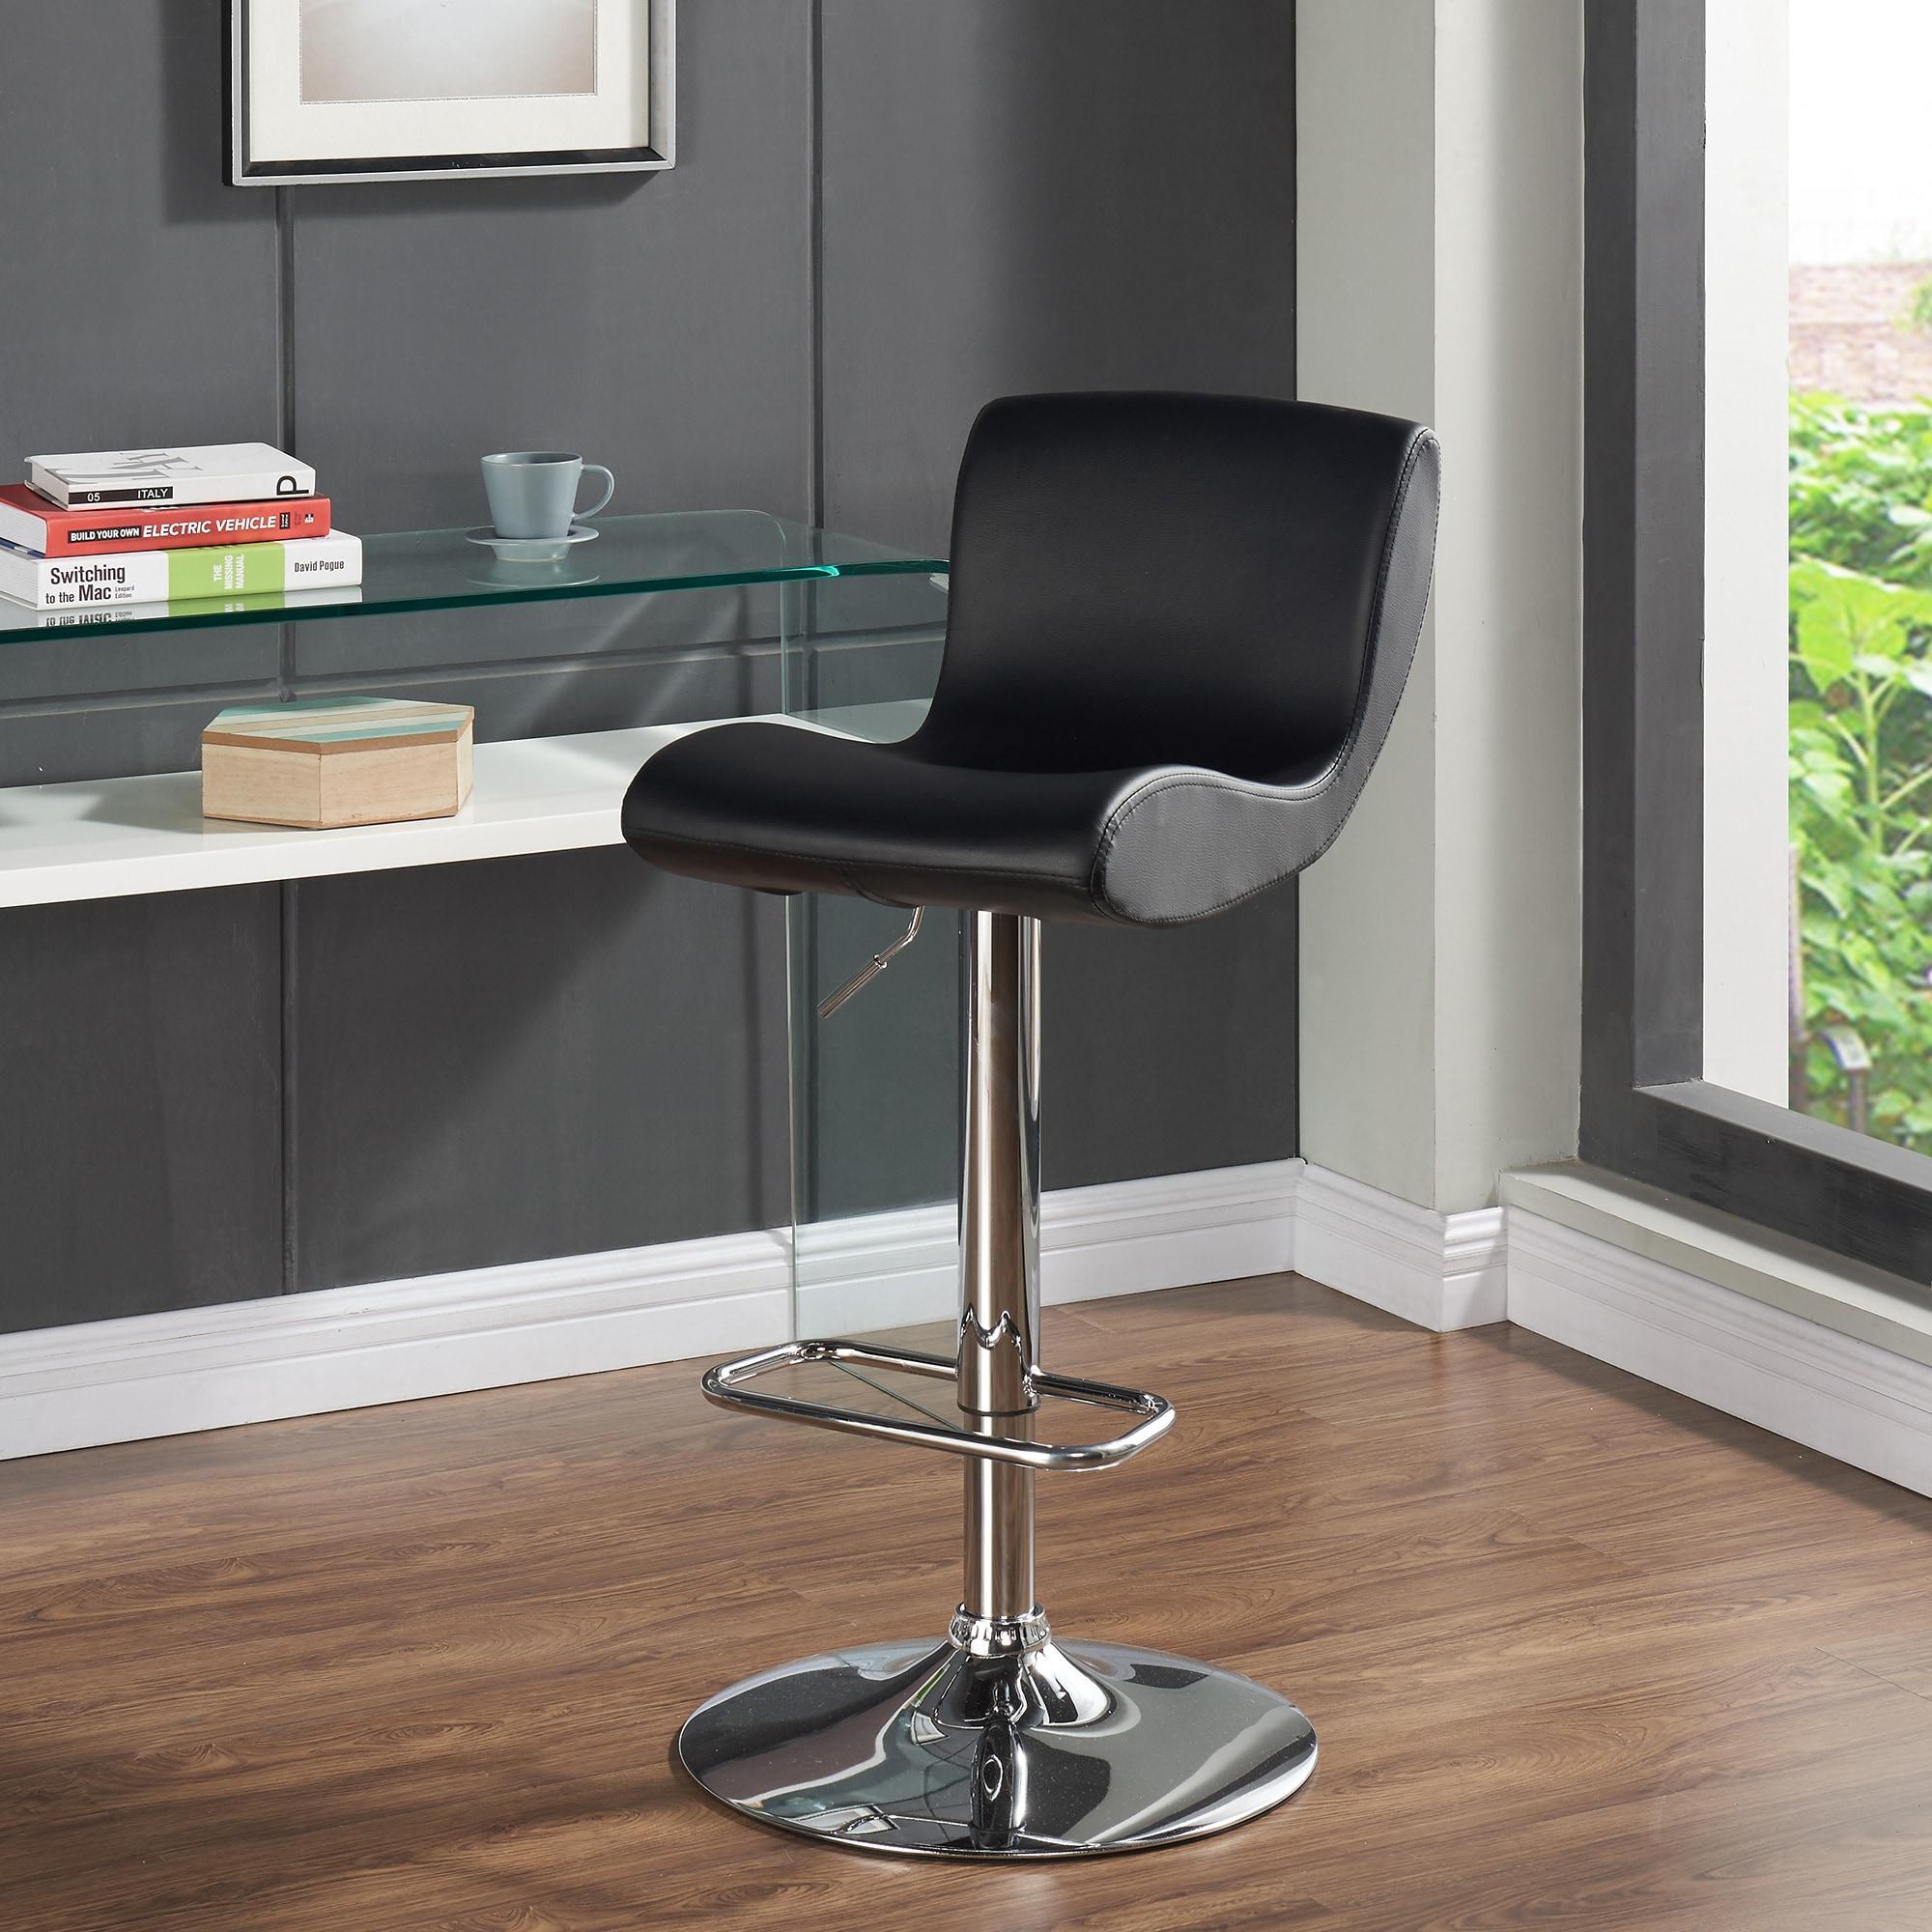 Astounding Silvio Adjustable Height Faux Leather Stool Set Of 2 Spiritservingveterans Wood Chair Design Ideas Spiritservingveteransorg